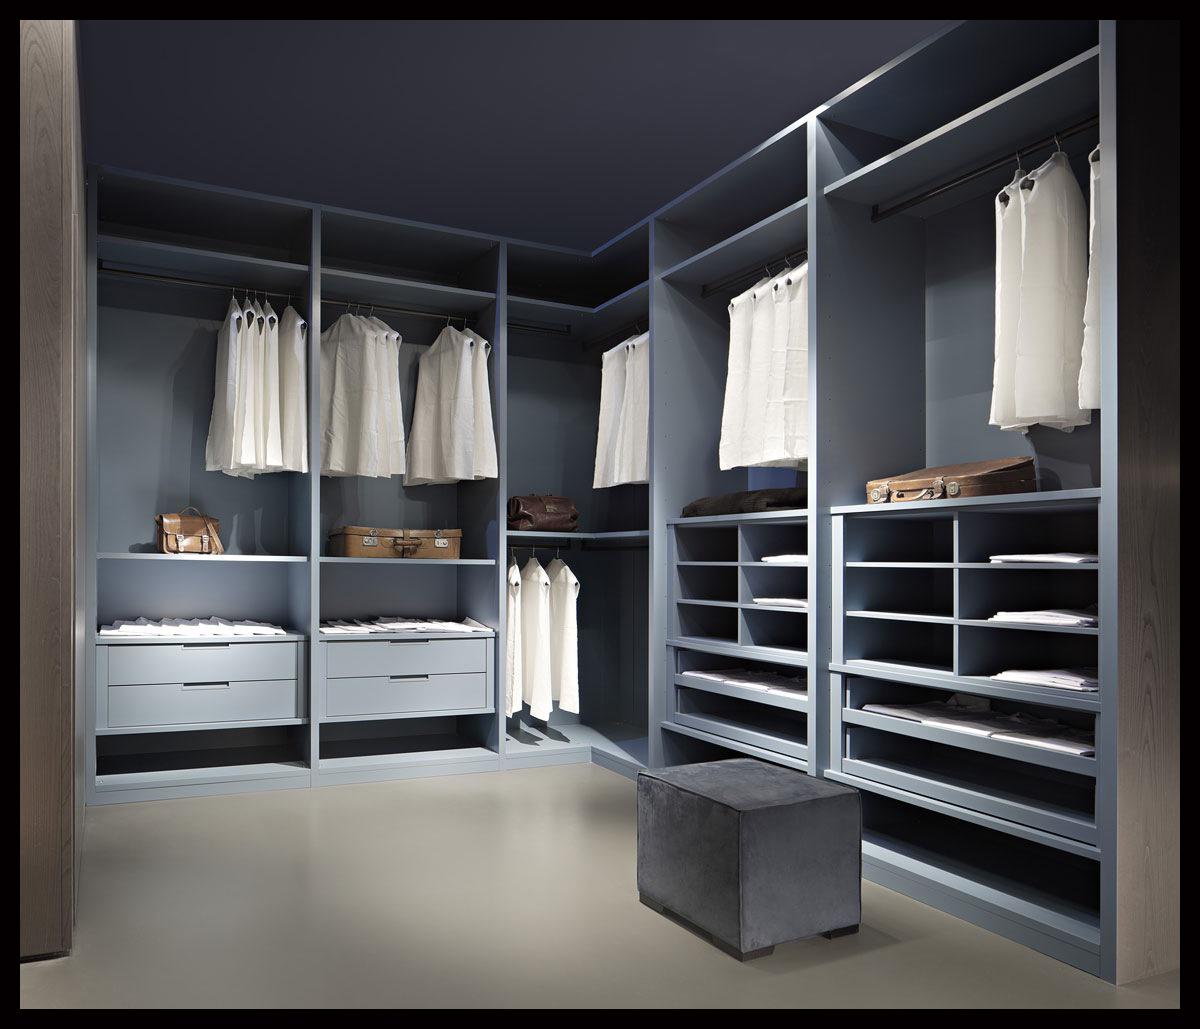 Modern Storage In UAE DESERT DREAMS DECOR Walk In Closets In UAE (2)